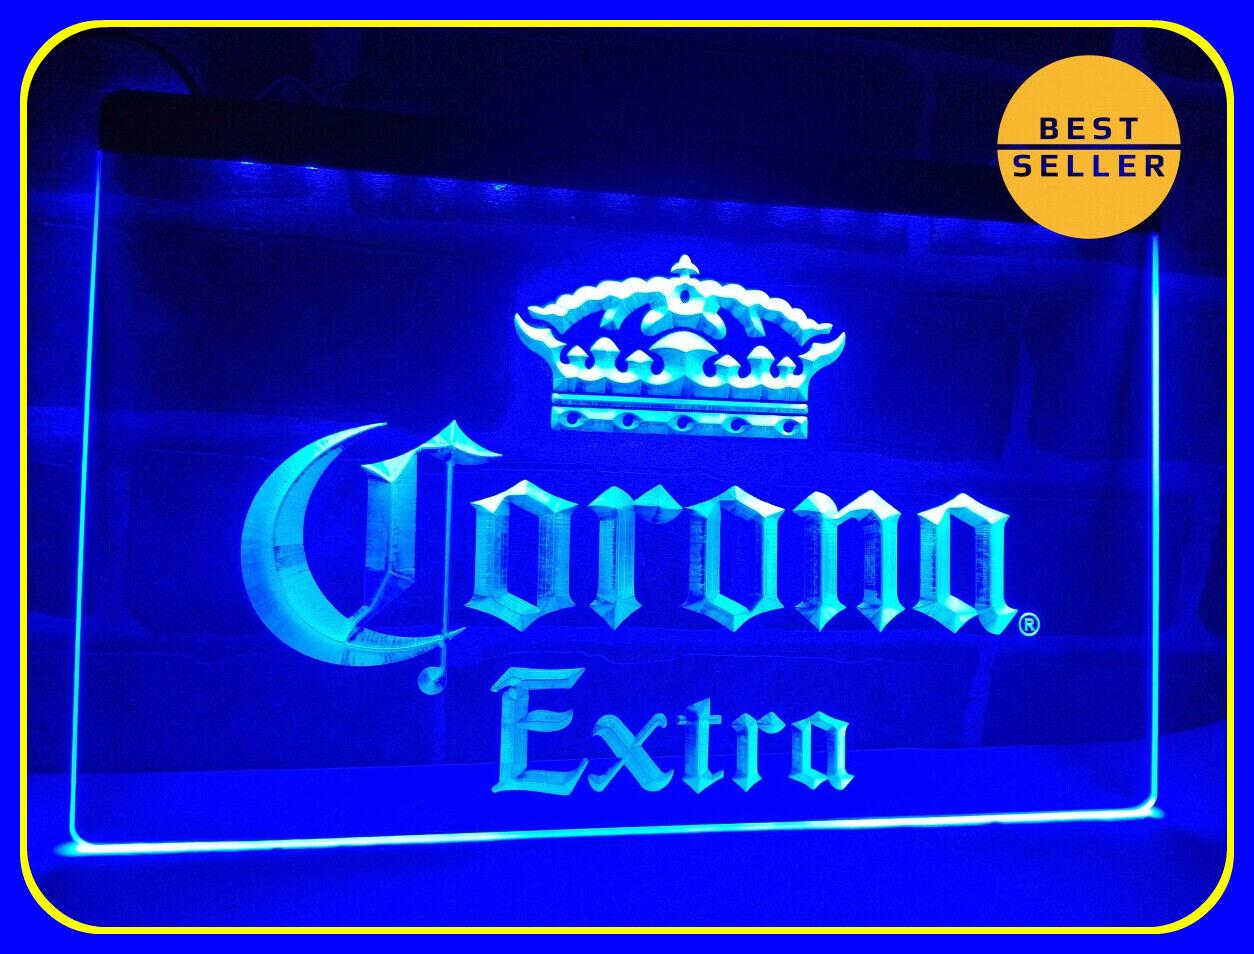 LED Neon Light Corona Extra Beer Bar Pub Cafe Sign Advertise